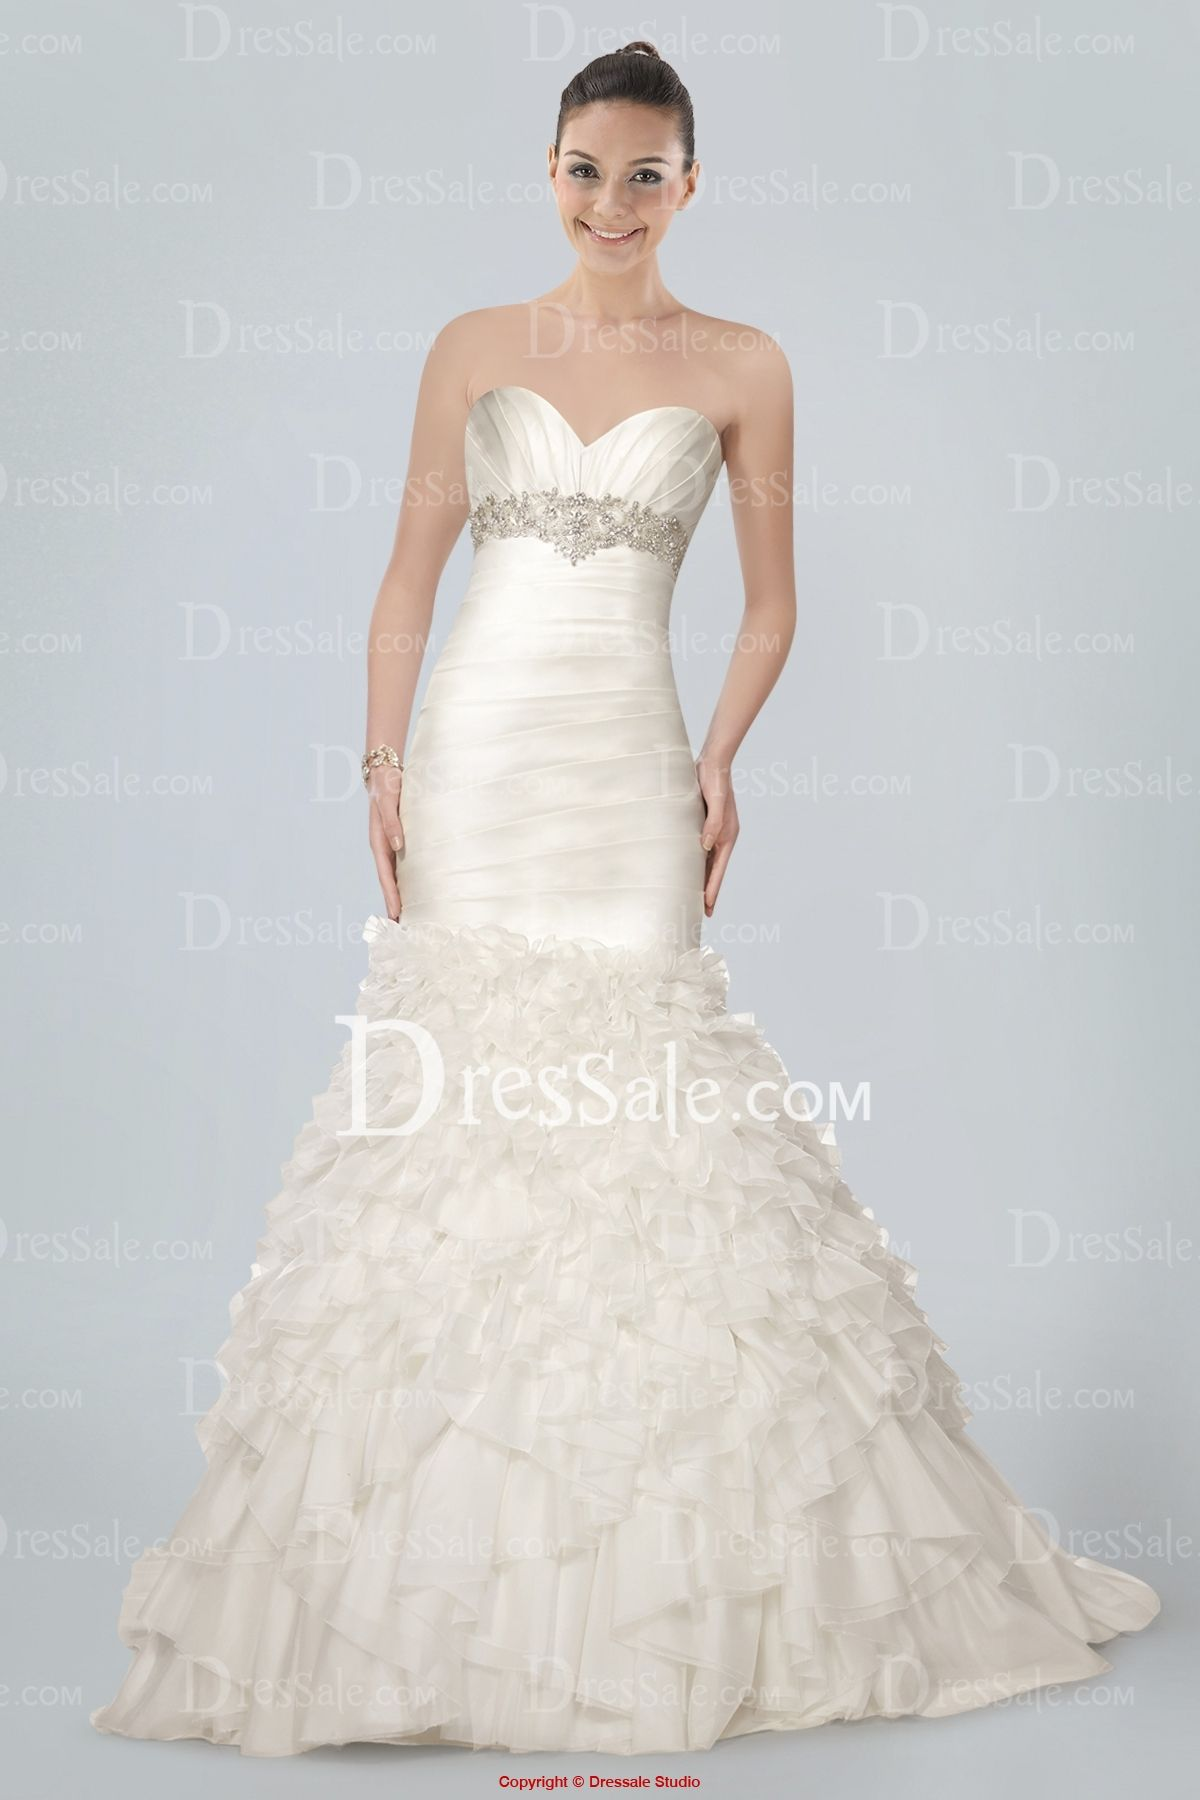 Mermaid ruffle wedding dress  Formidable Strapless Mermaid Wedding Gown Featuring Beaded Motifs